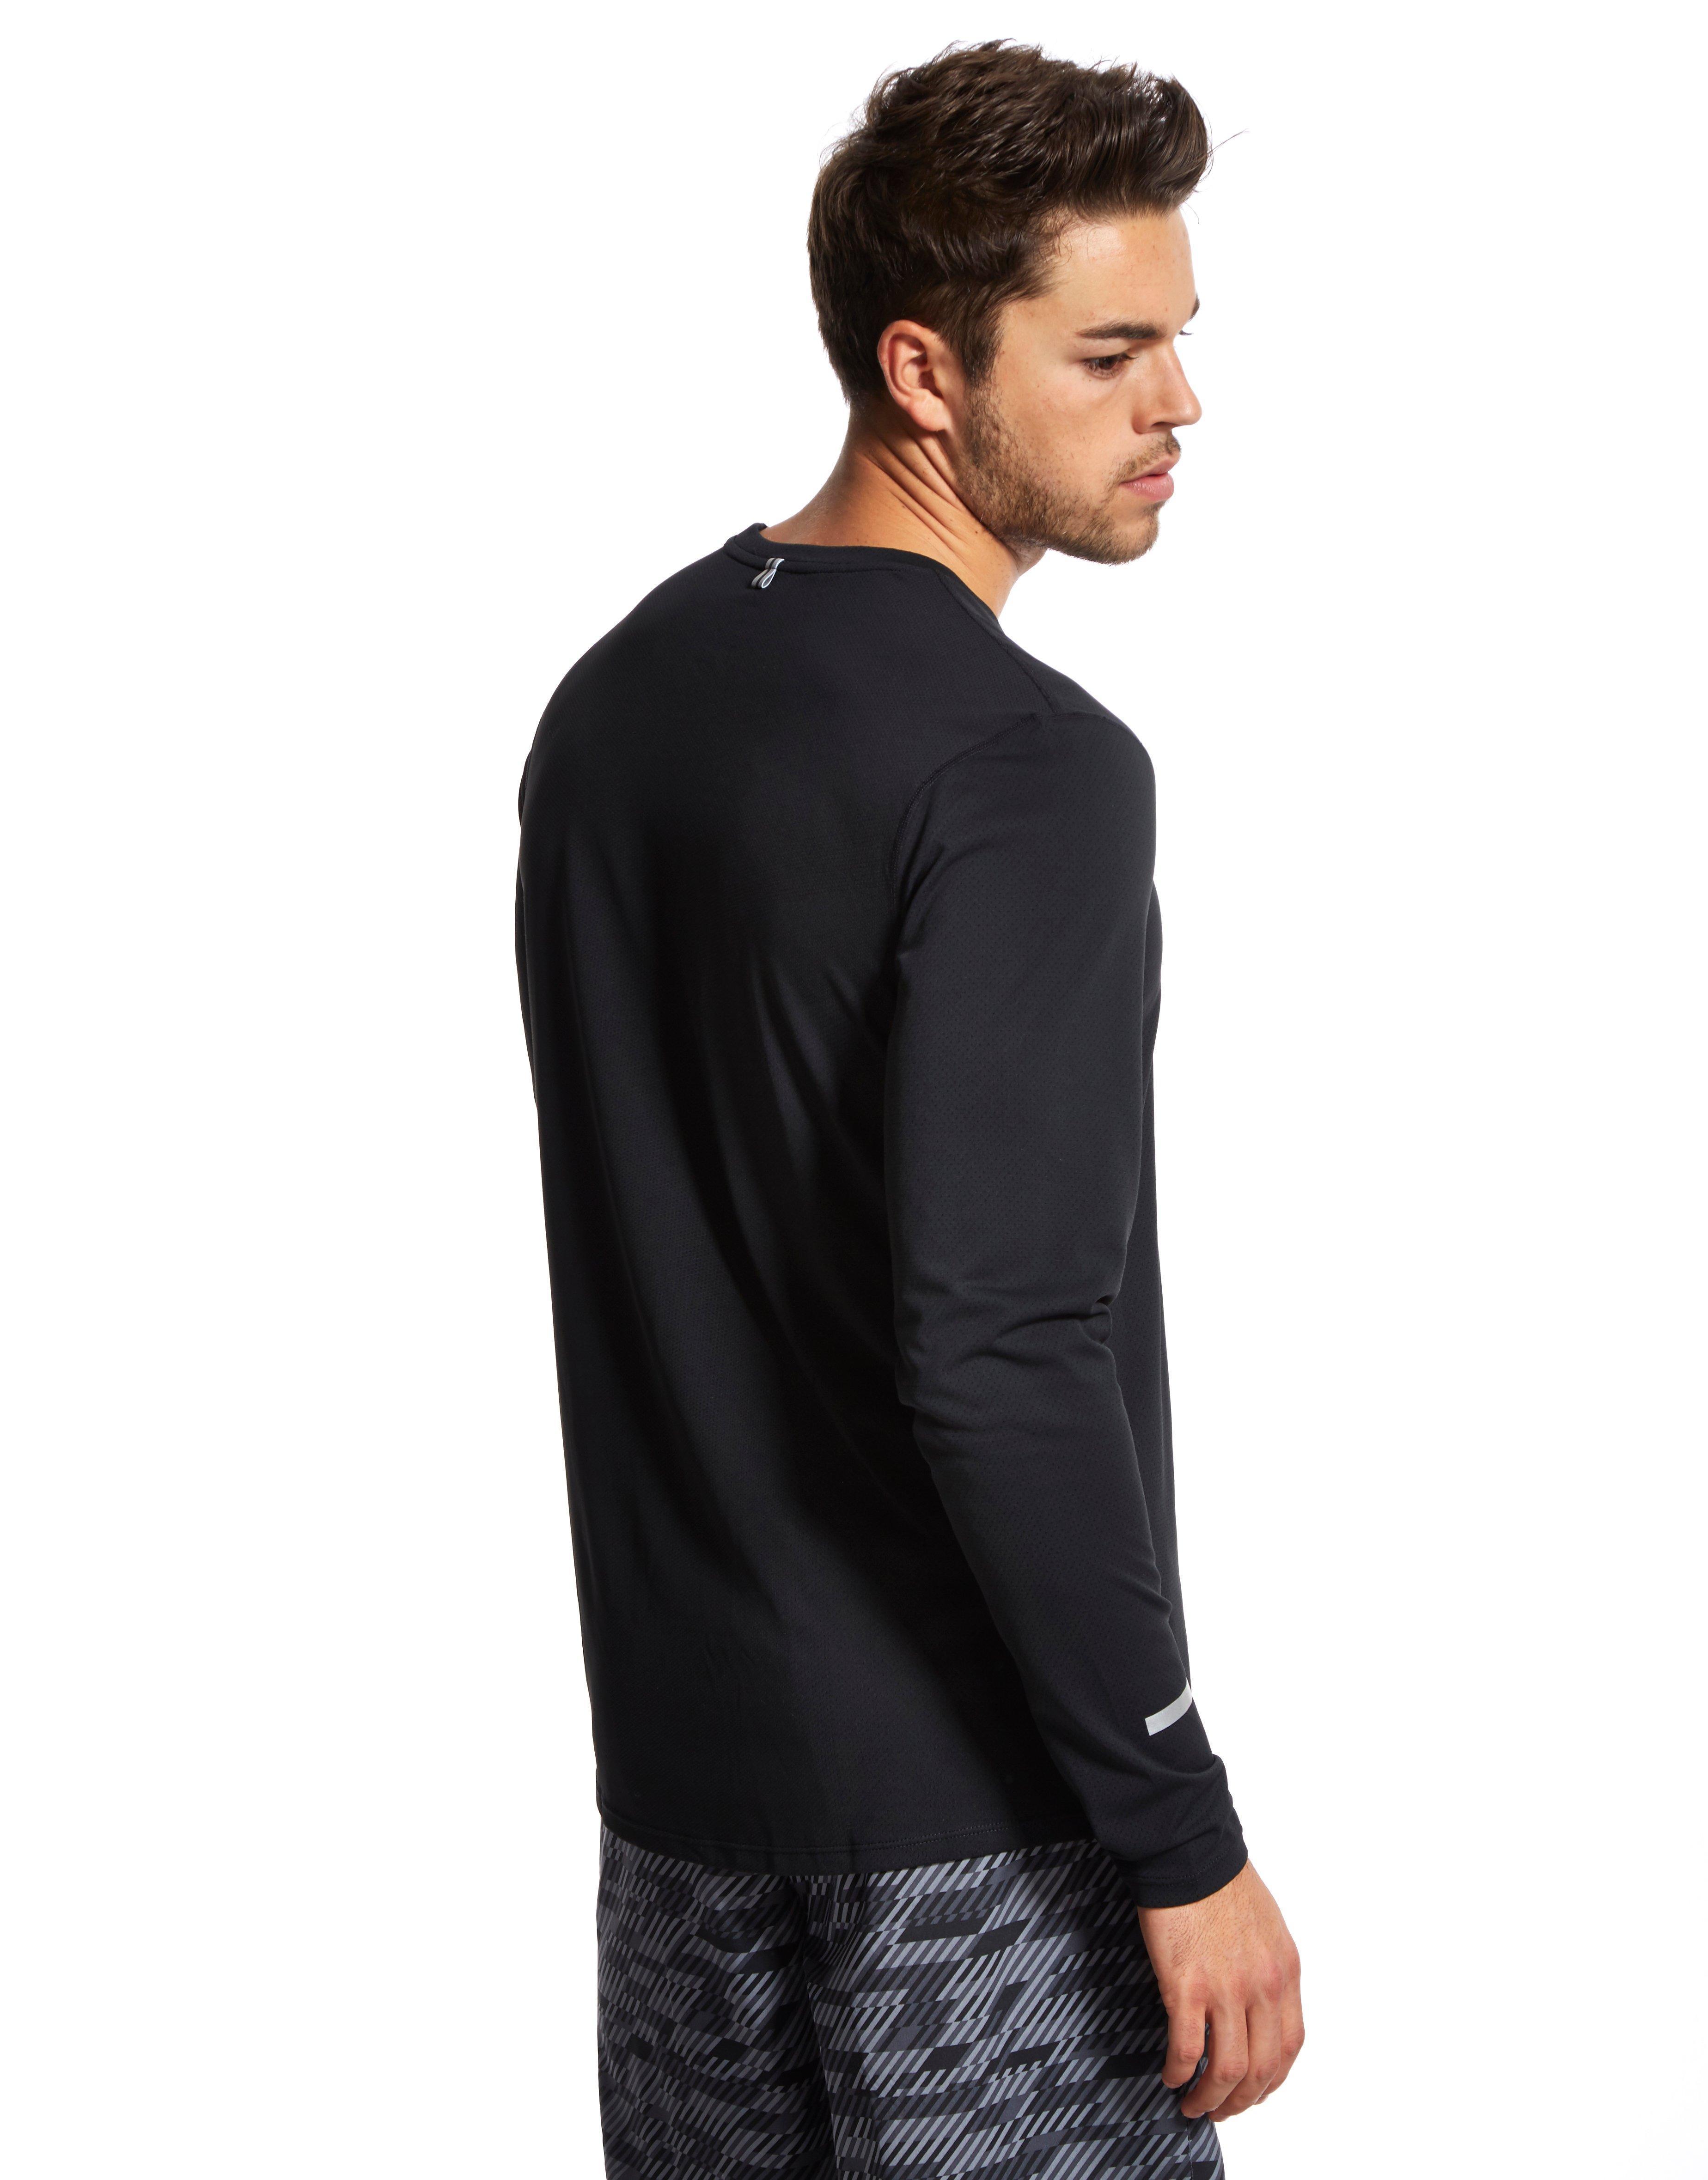 Nike Dri Fit Contour Long Sleeve T Shirt In Black For Men